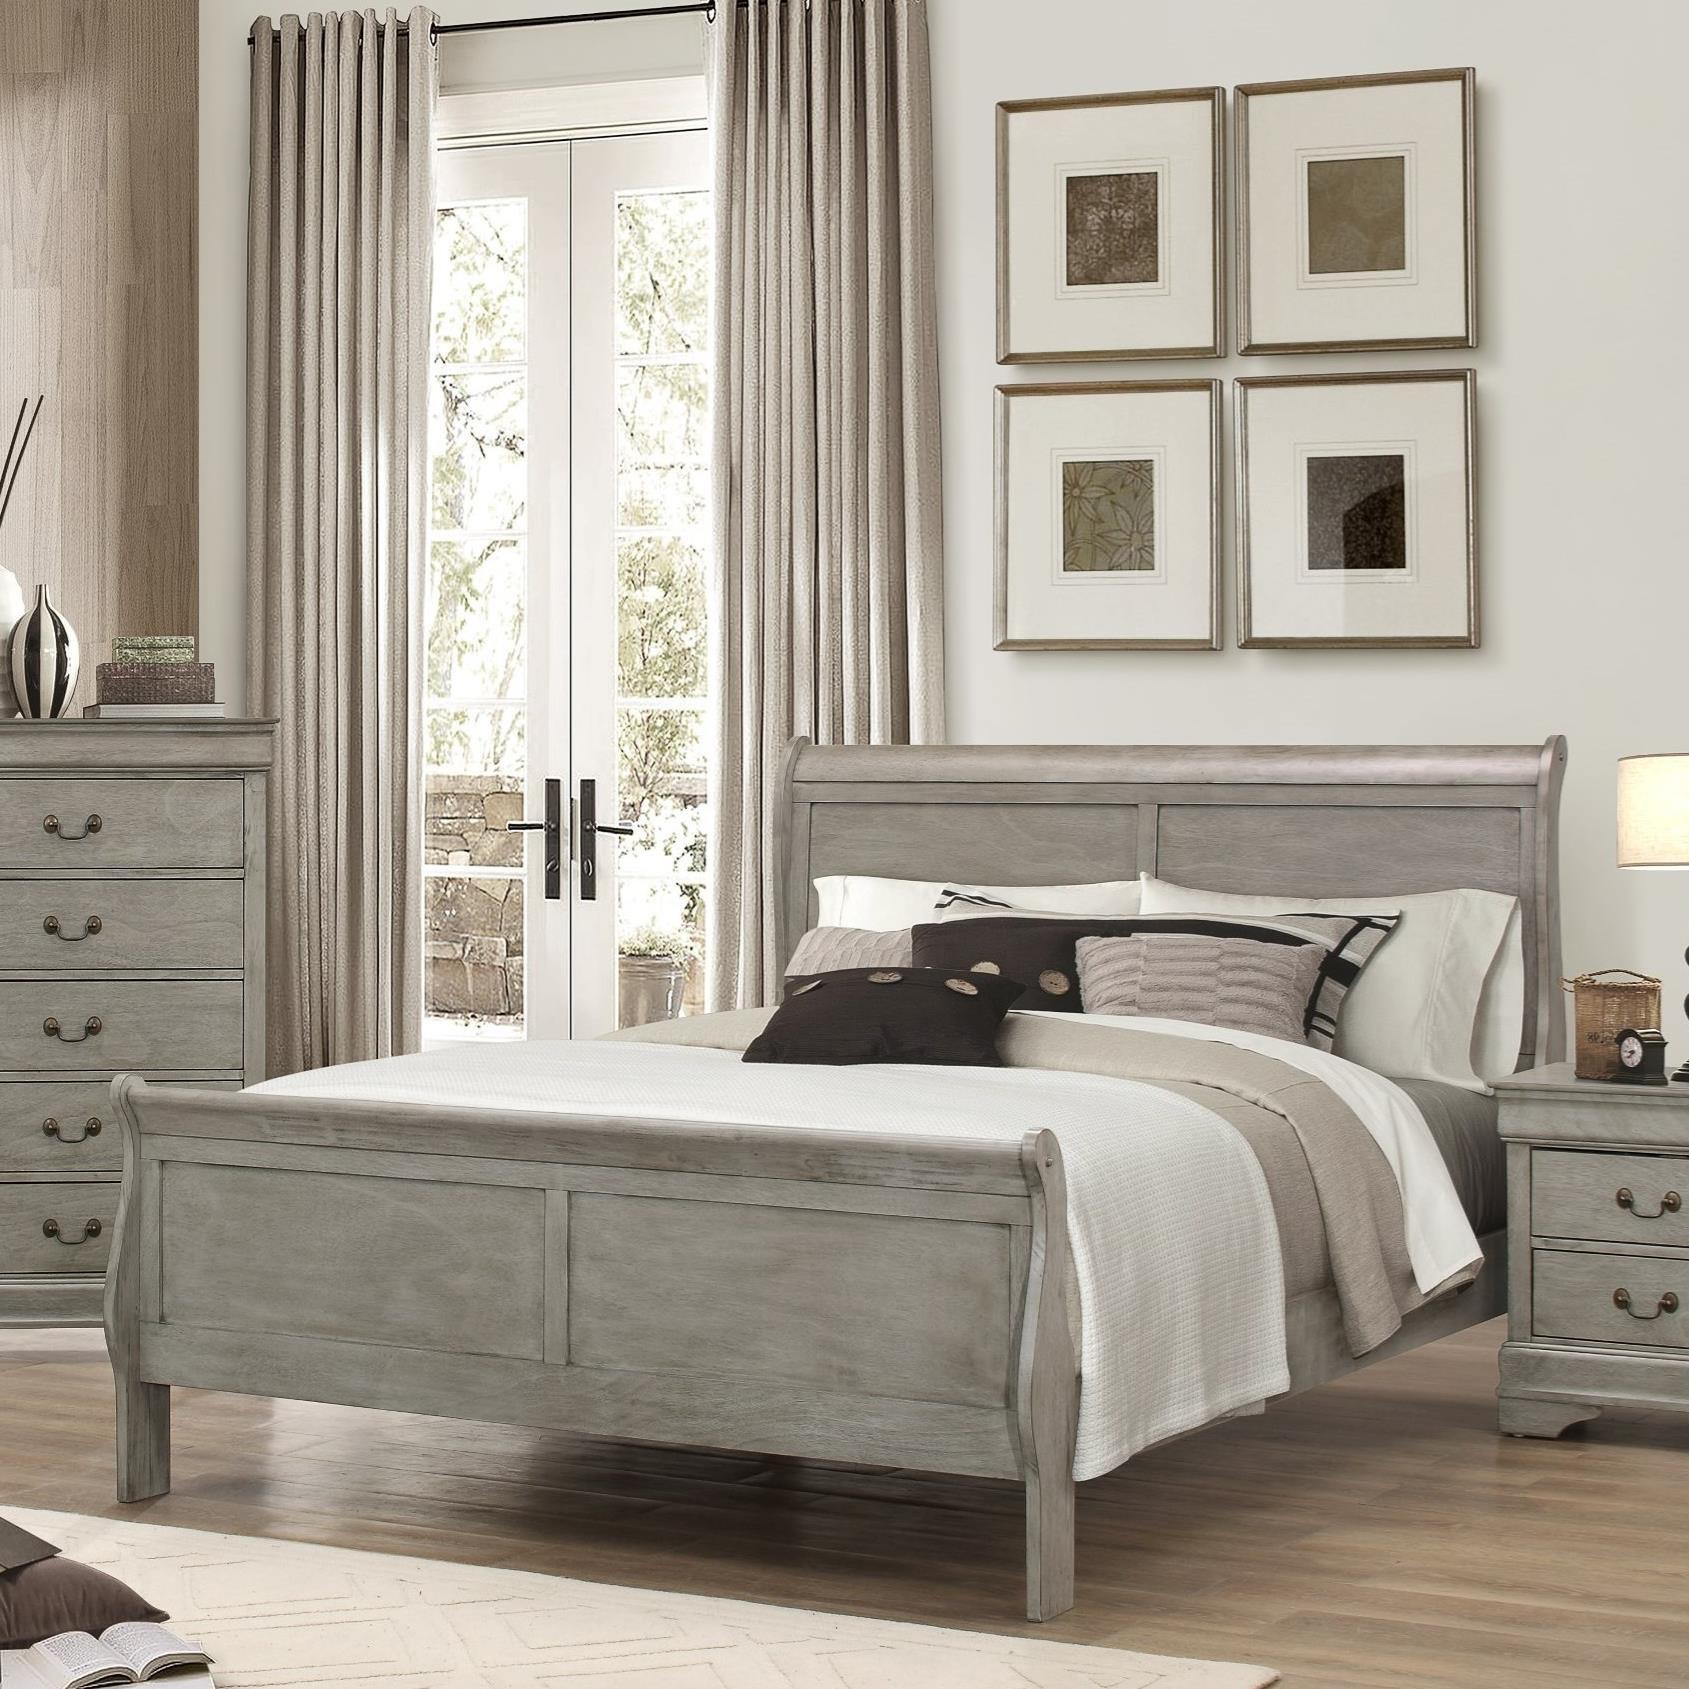 Crown Mark Louis Phillipe King Bed - Item Number: B3500-K-HBFB+RAIL